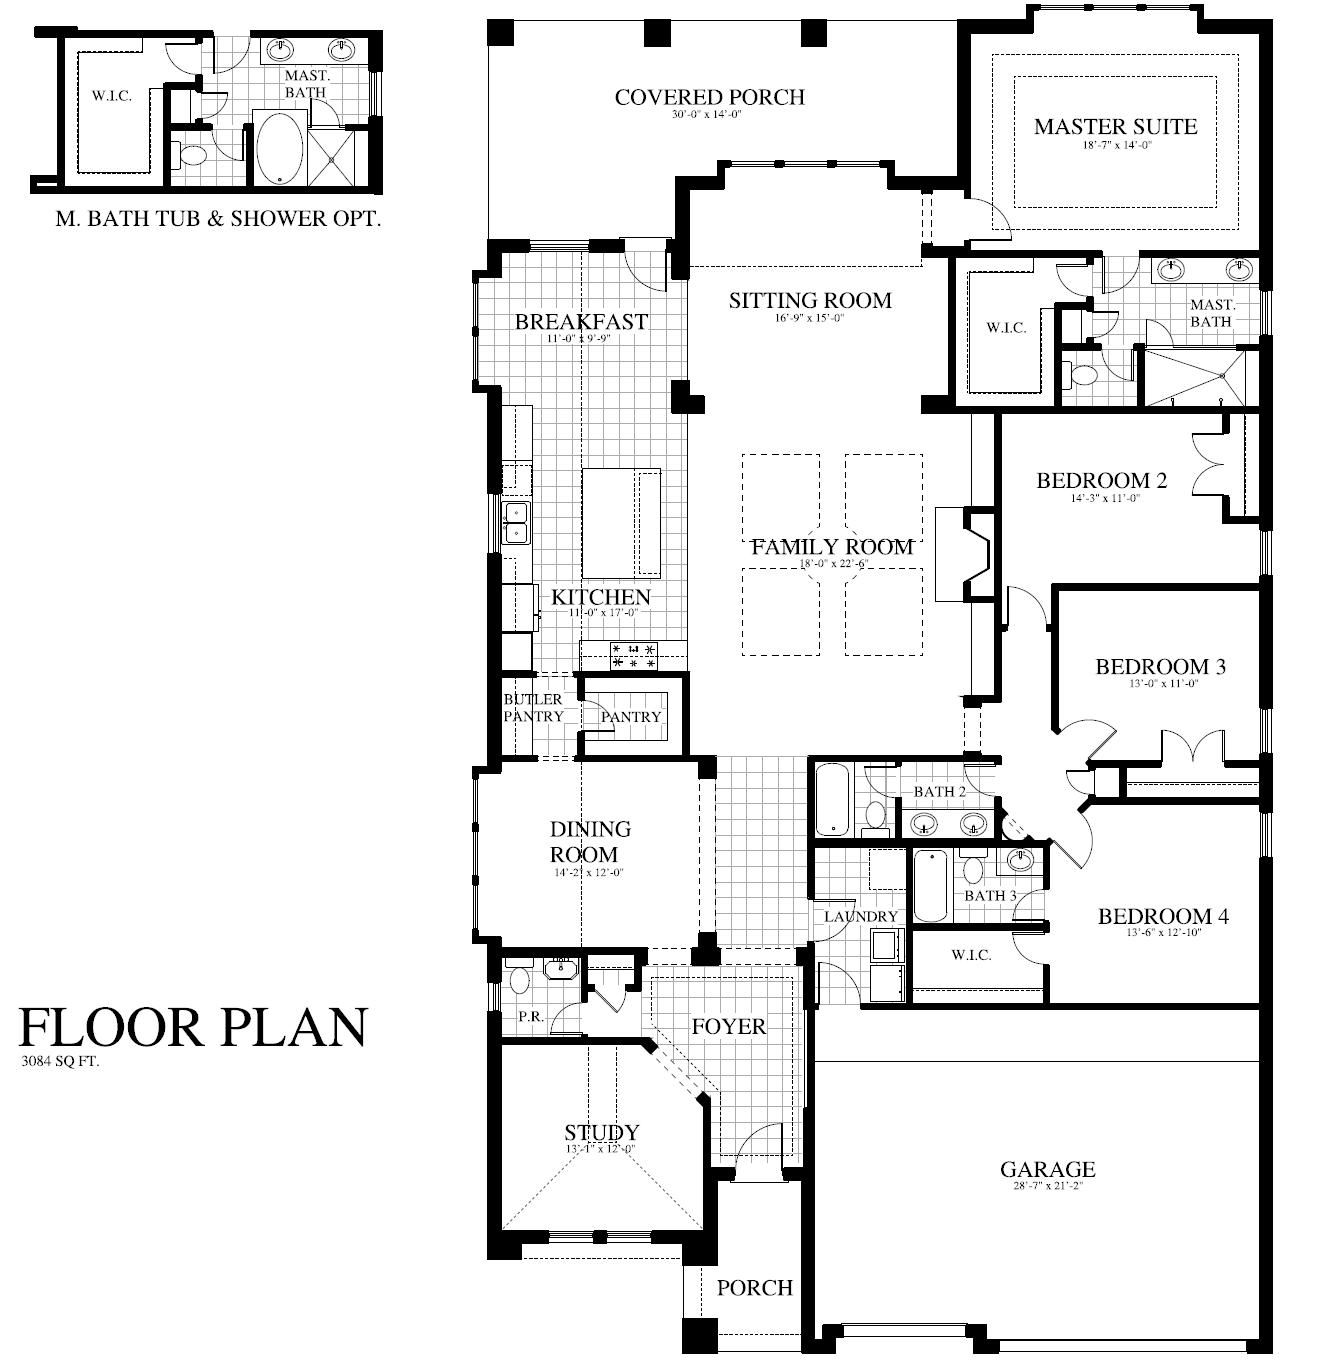 507 c saratoga homes killeen for Saratoga homes floor plans